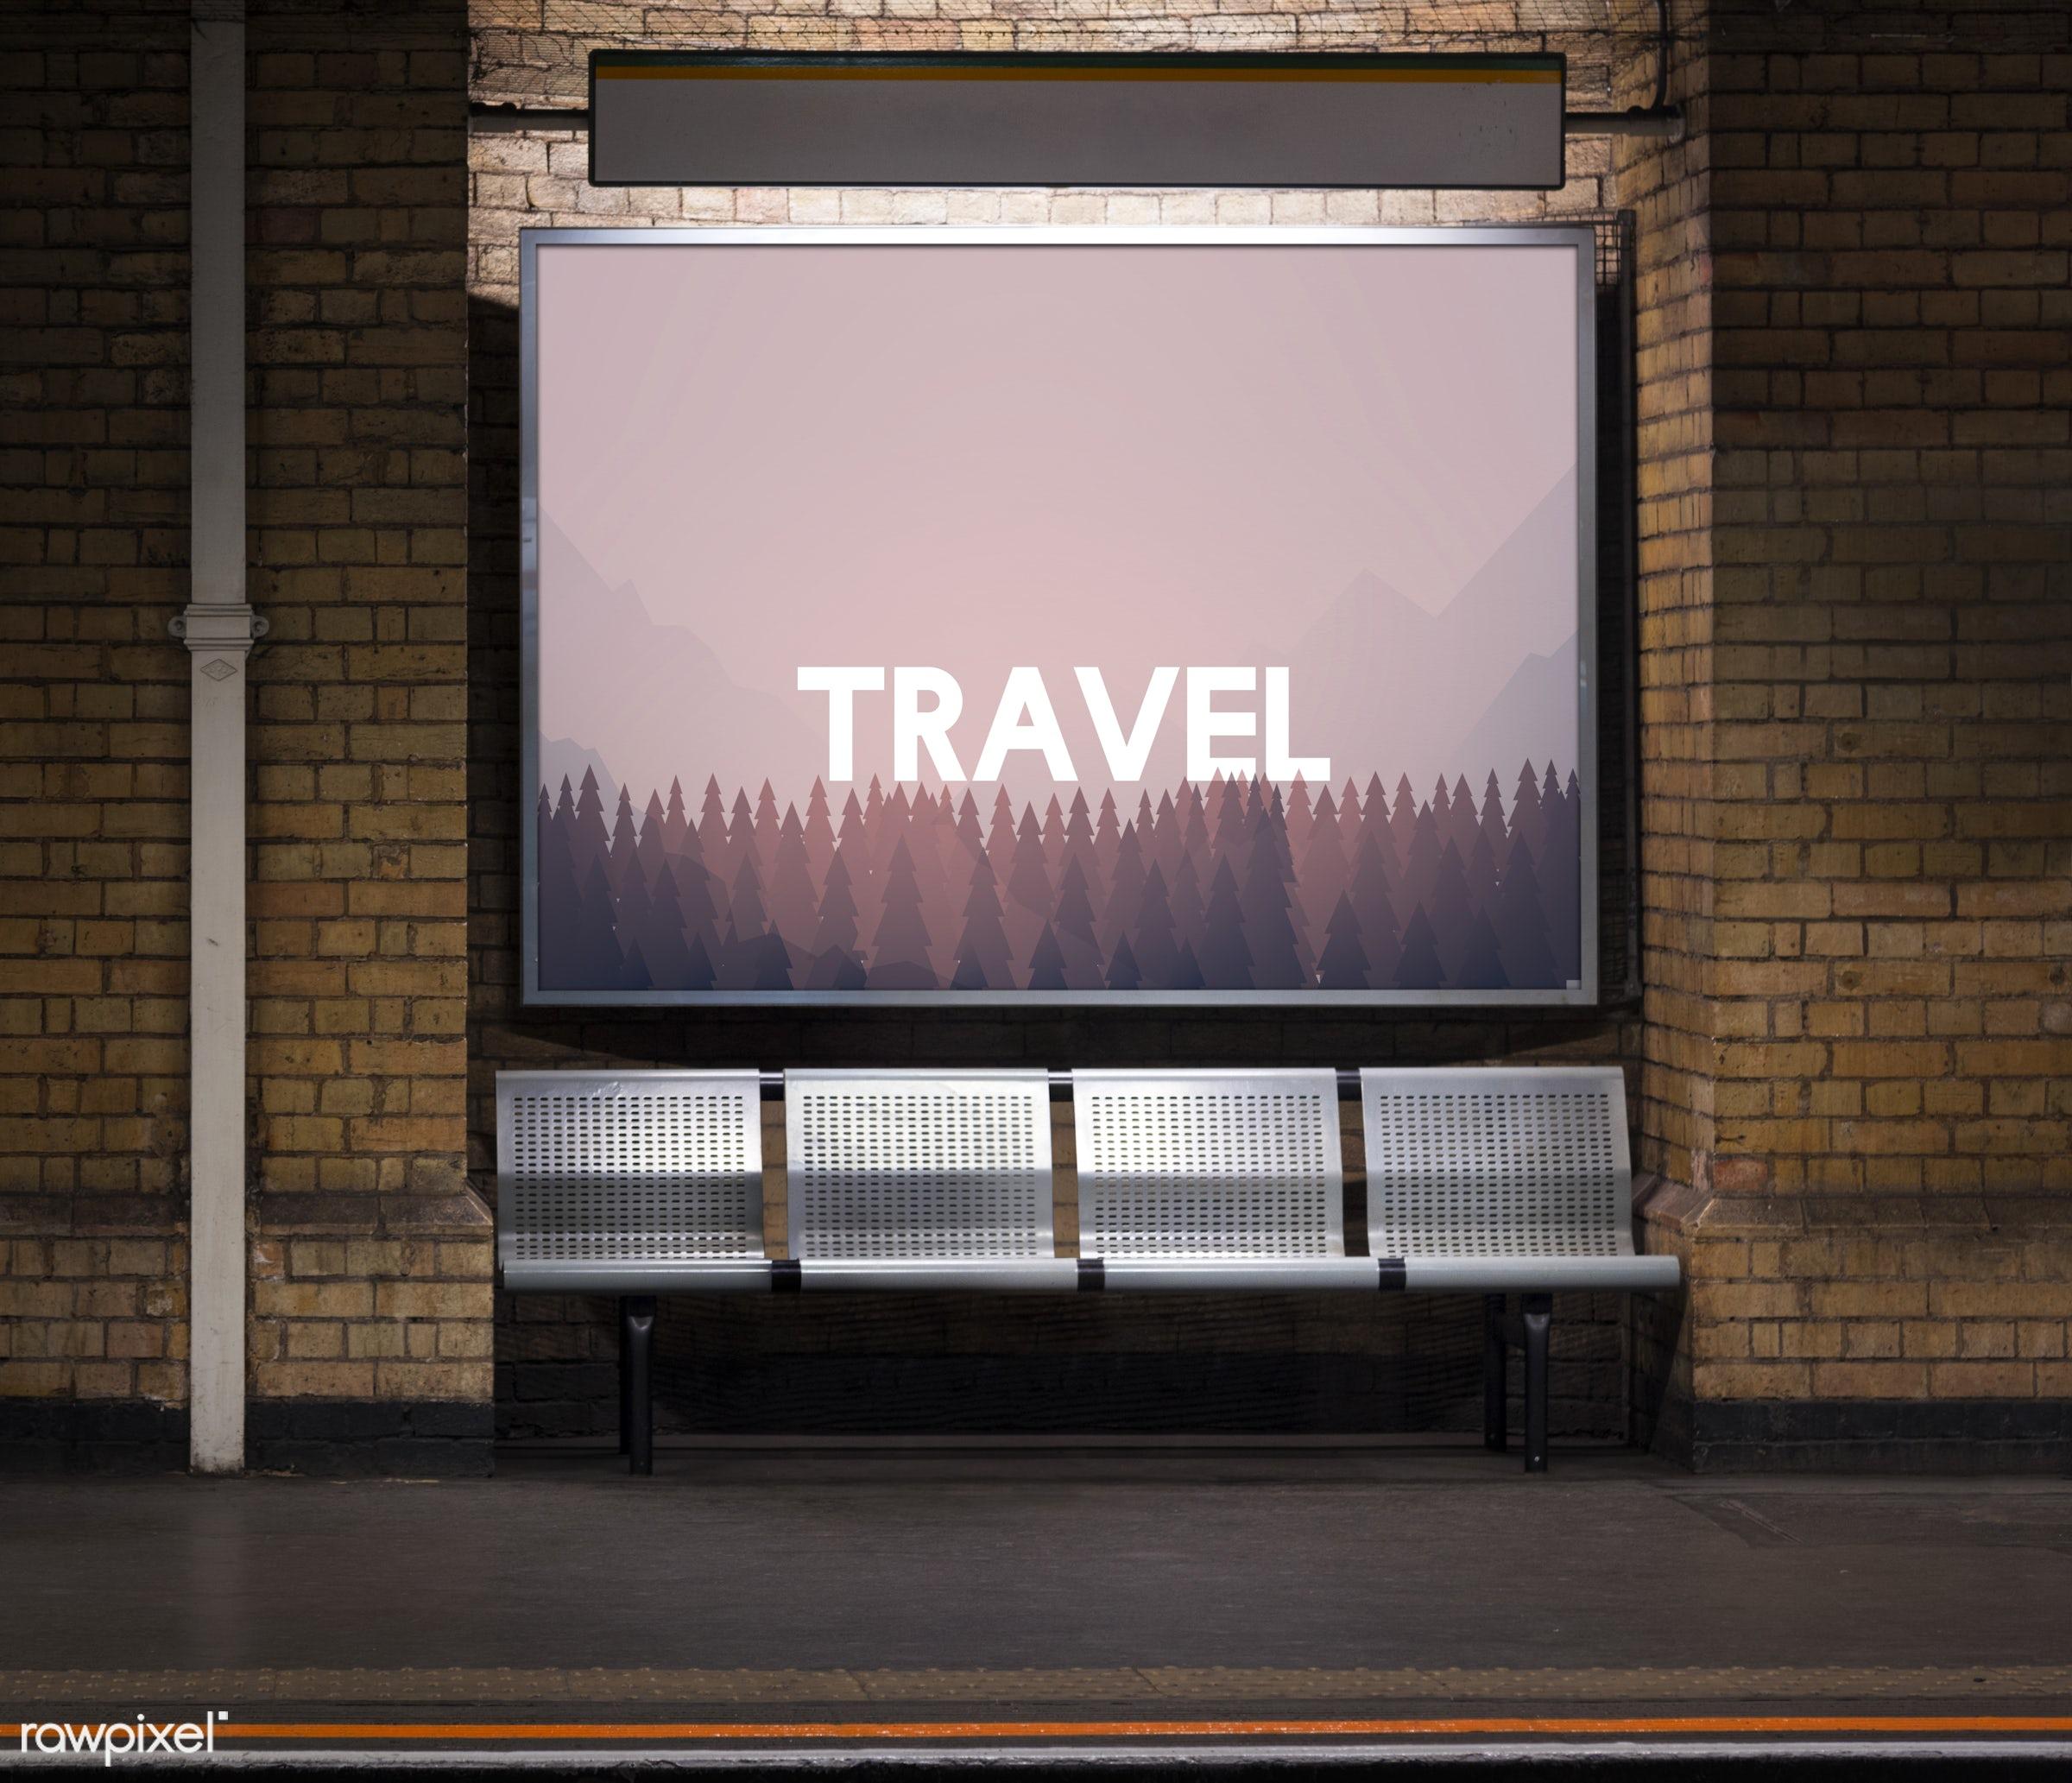 adventure, bricks, brickswall, destination, discovery, environment, excursion, experience, exploration, itinerary, journey,...